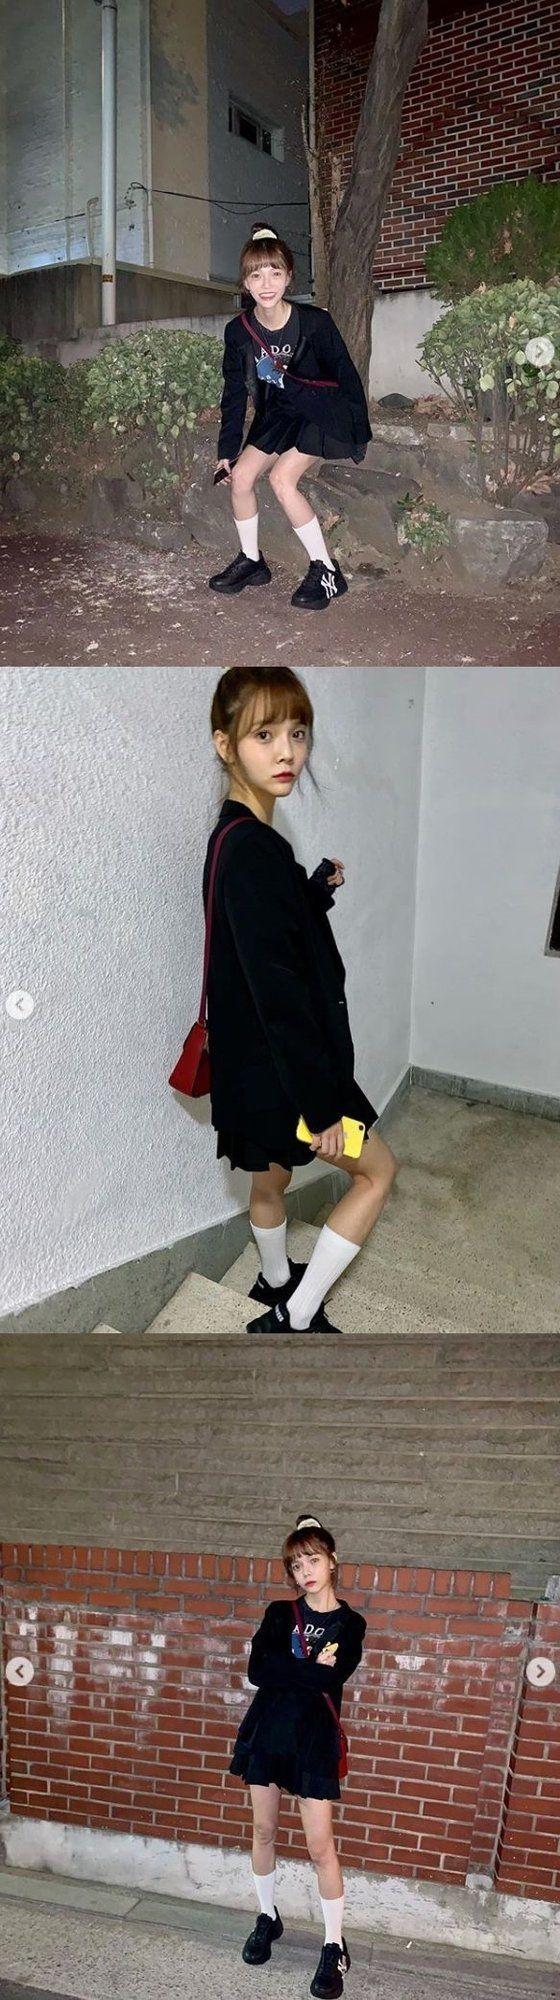 AOA 지민의 '건강 이상설'에 대해 소속사 FNC 측이 밝힌